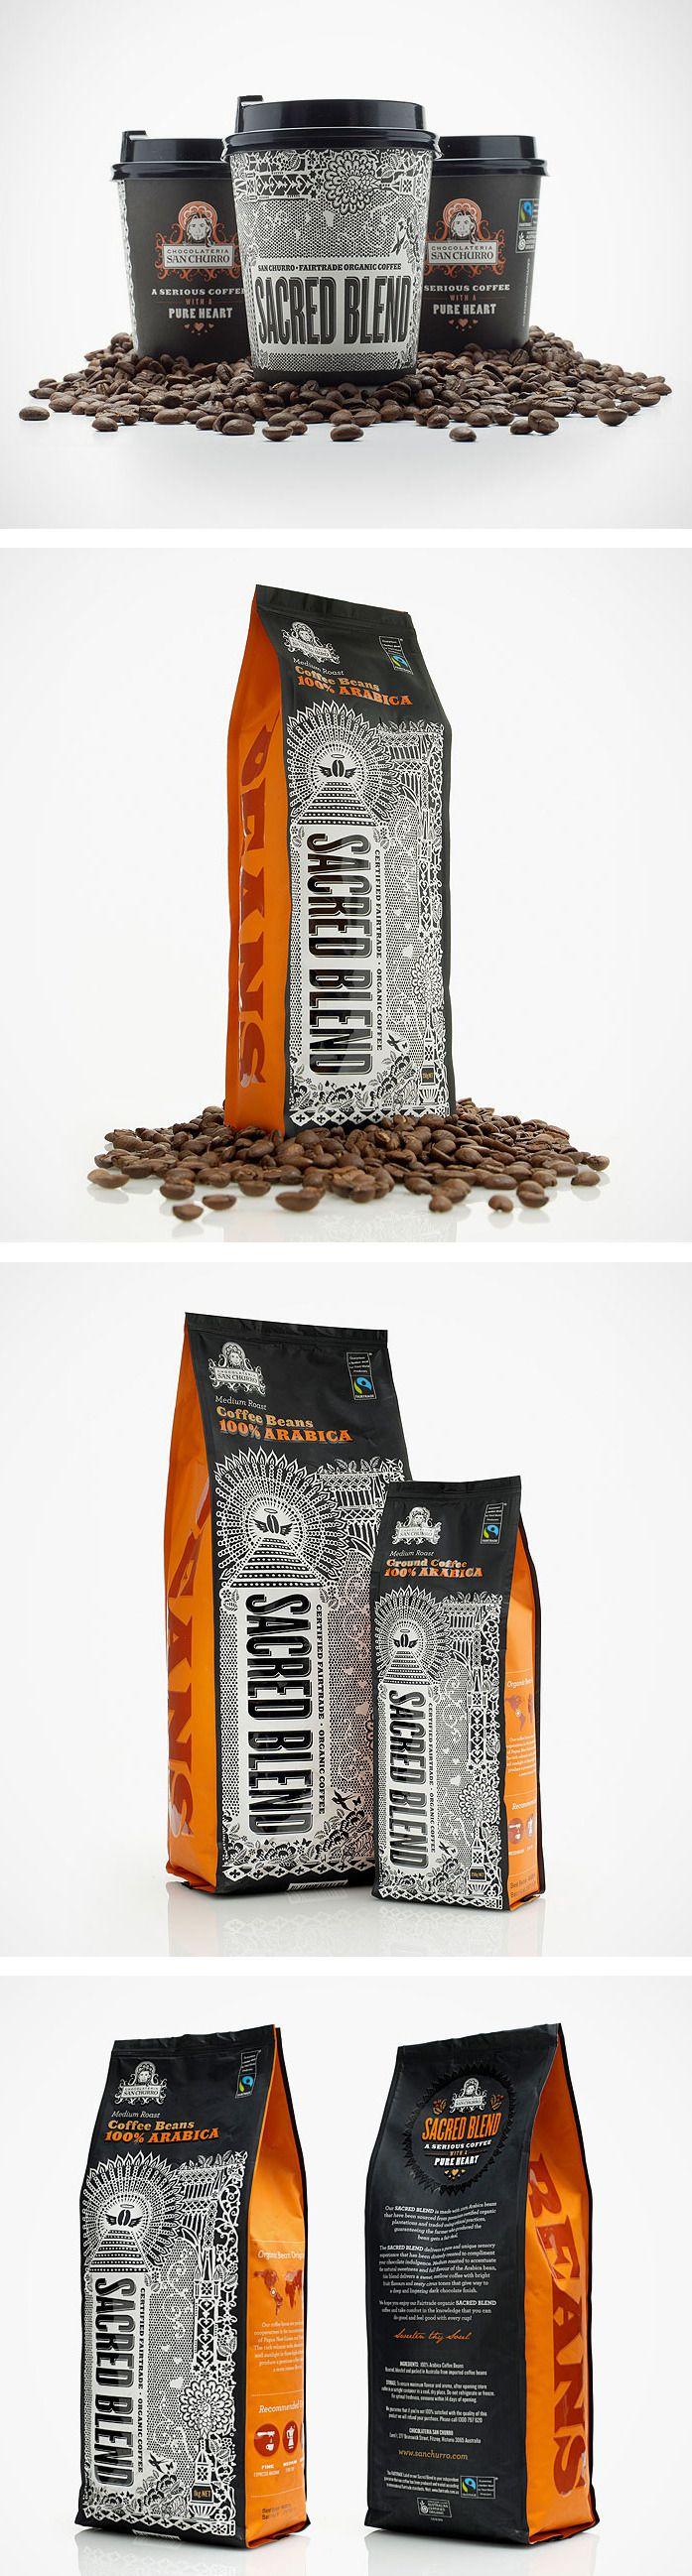 Coffee Packaging Designs 37 best coffee packaging & design images on pinterest | coffee